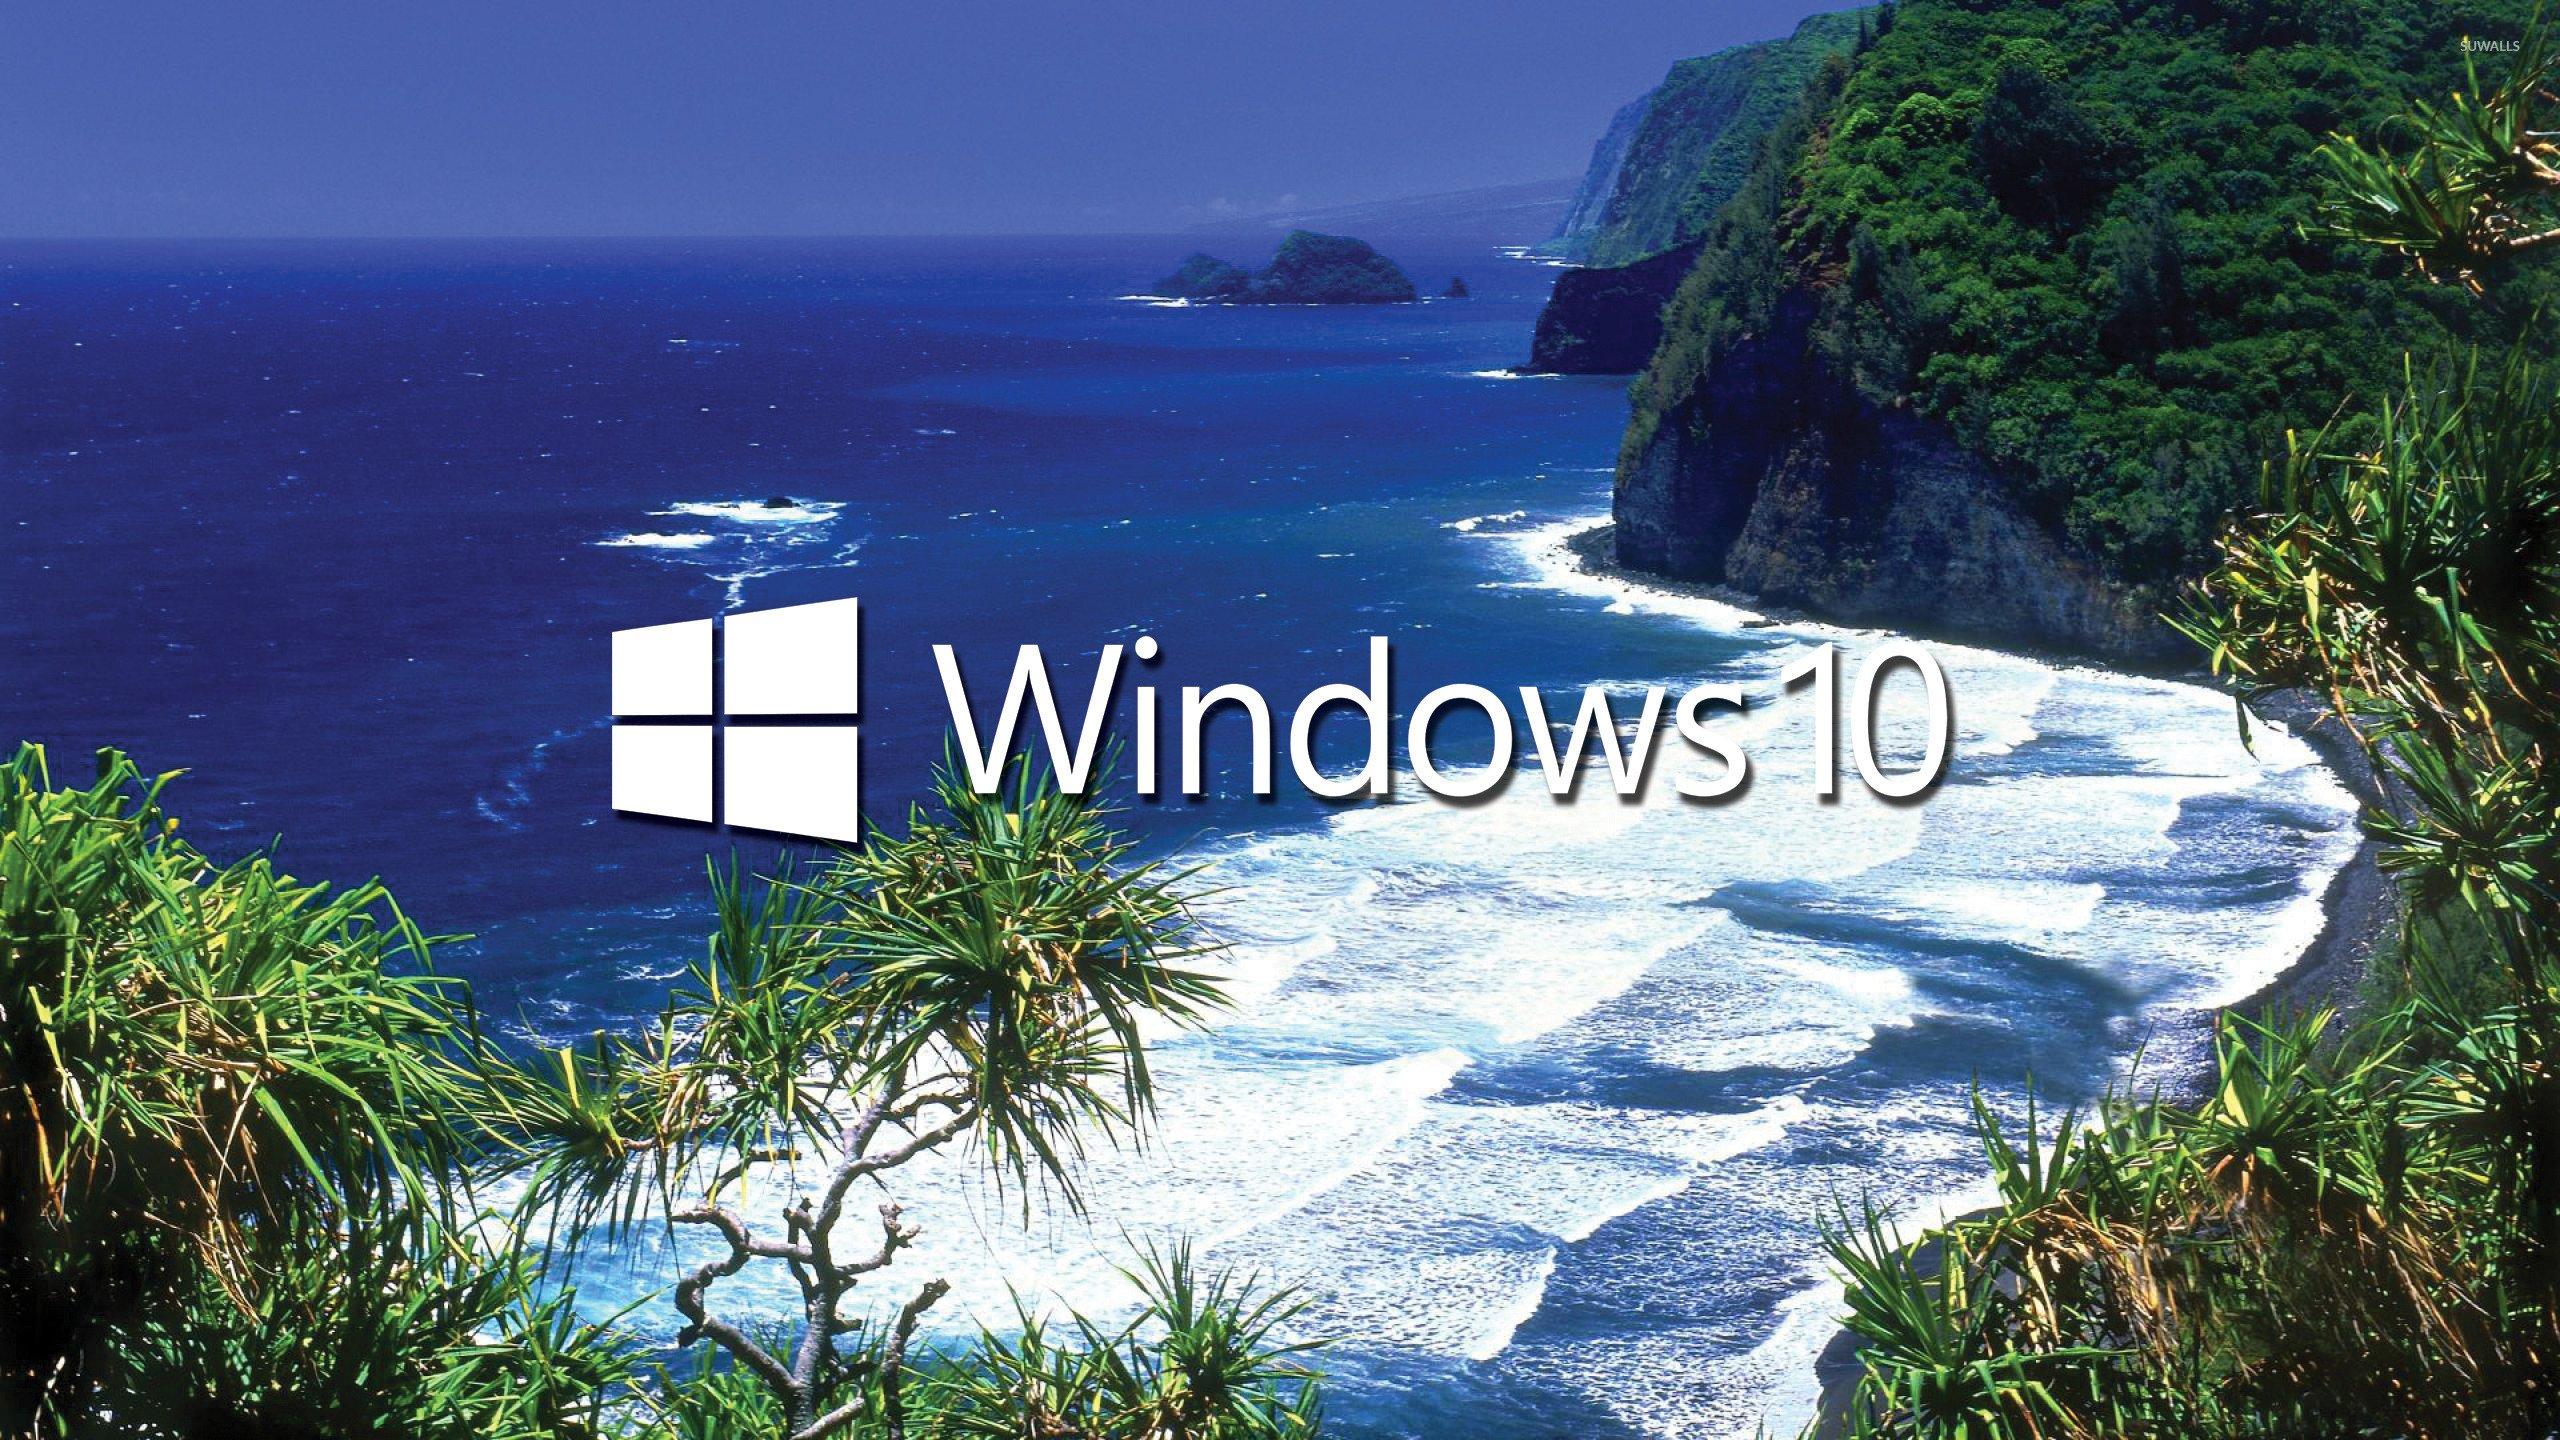 [46+] 2560x1440 Wallpaper Windows 10 On WallpaperSafari